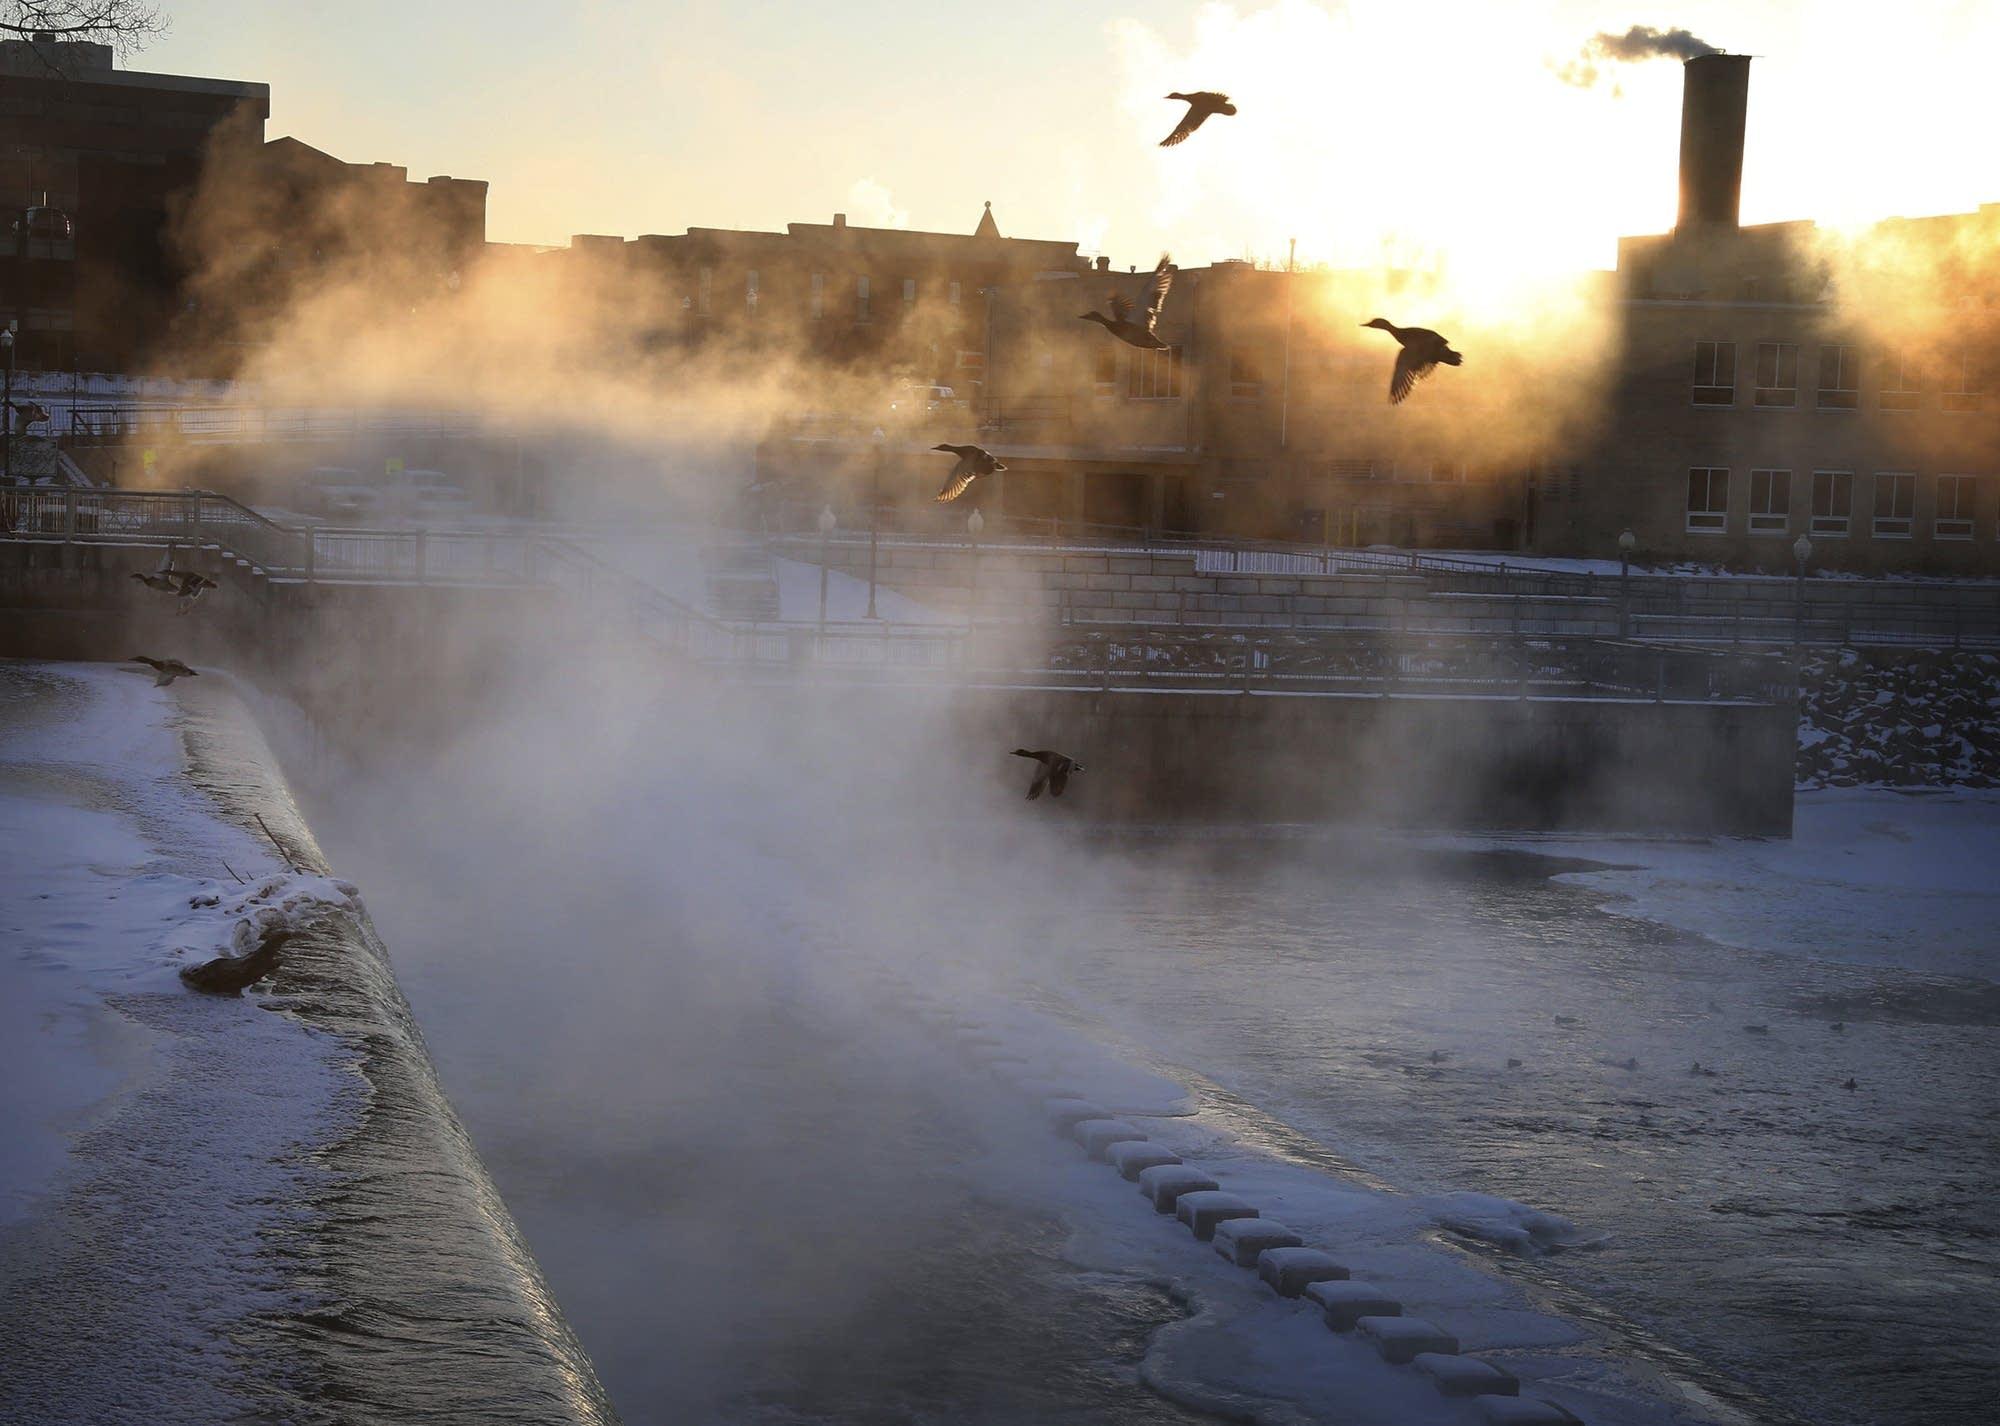 Birds take flight over the frigid waters below the Rum River Dam.